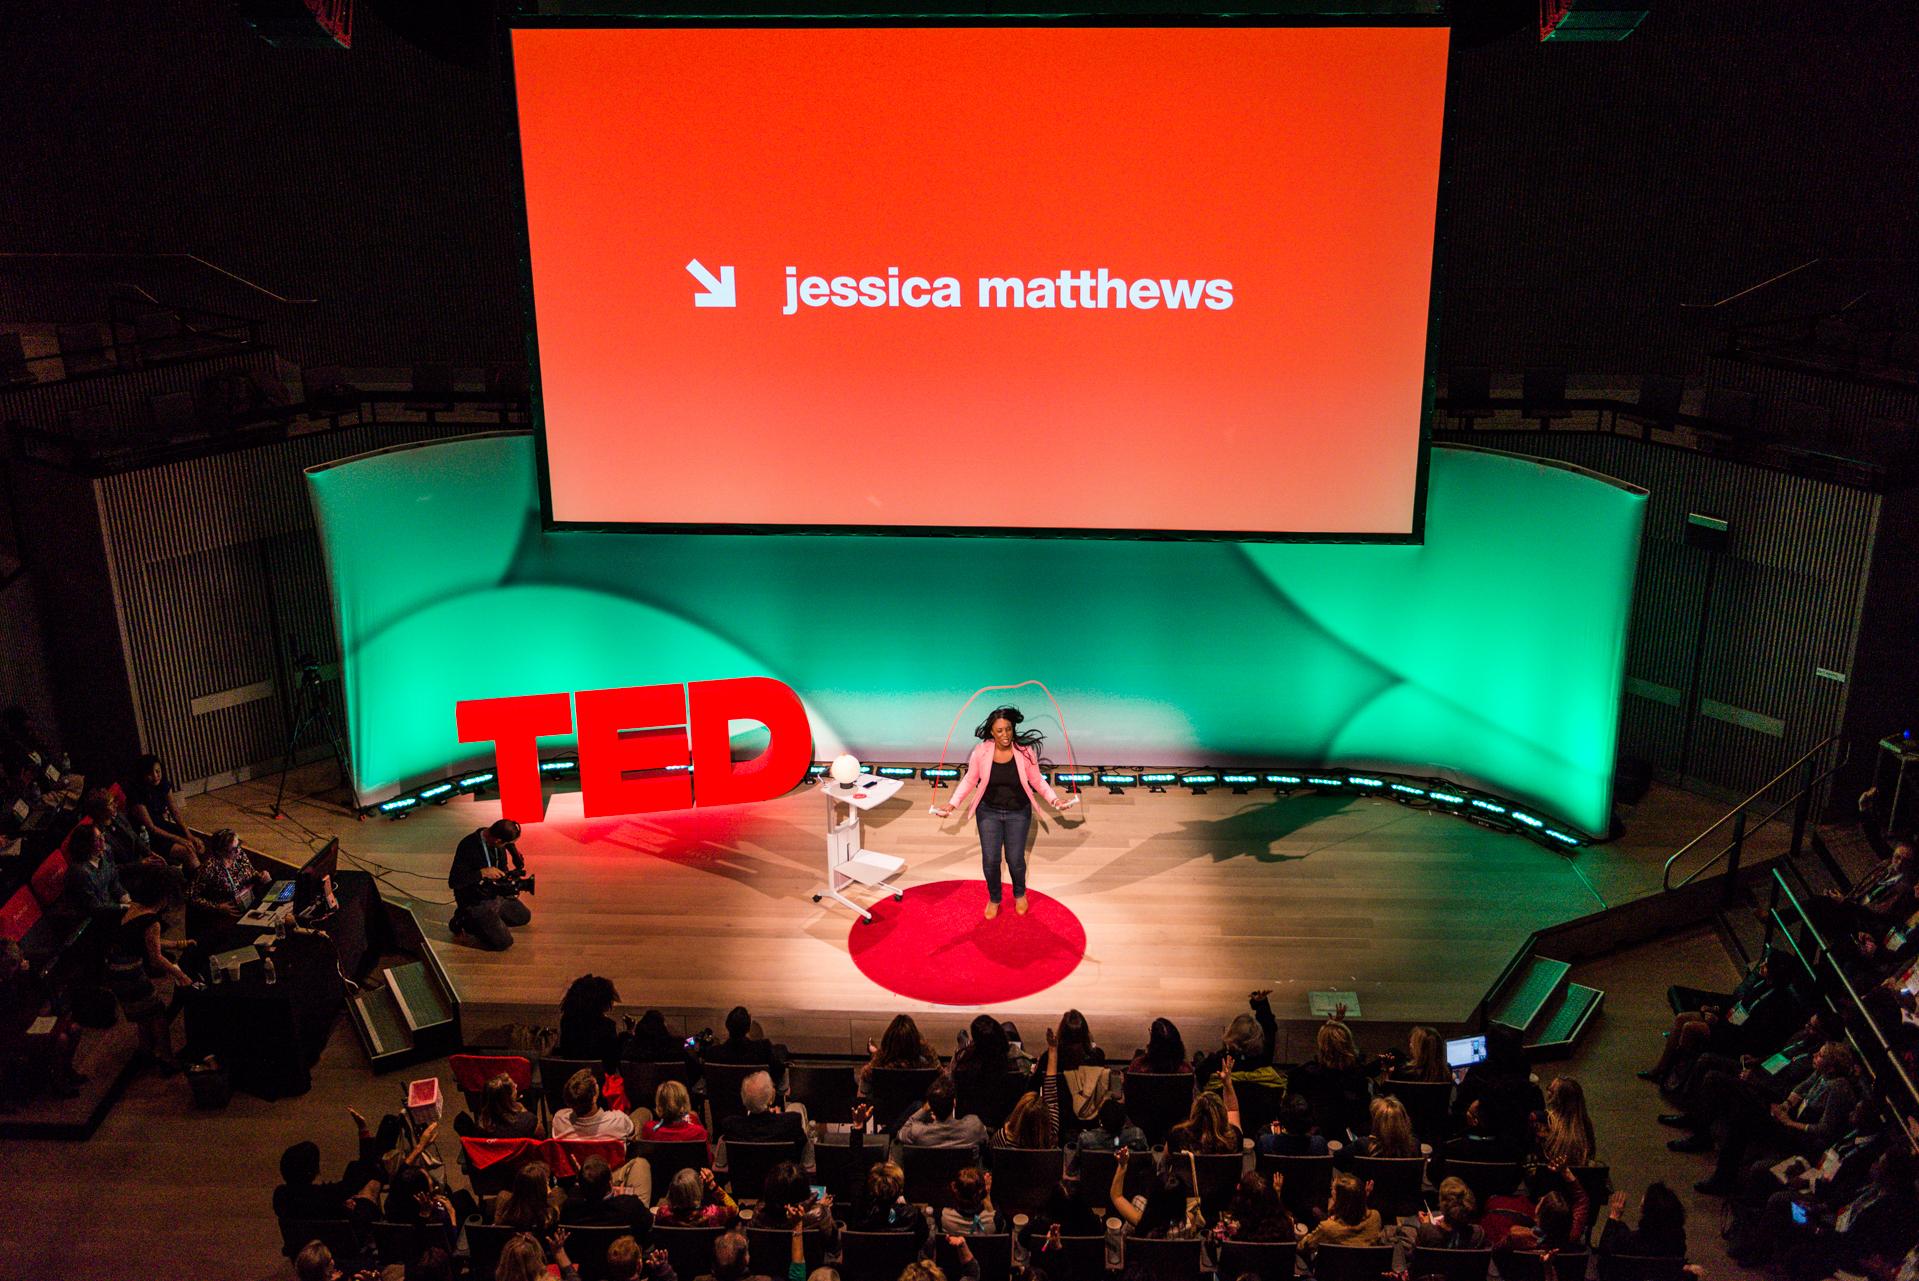 Jessica Matthews demonstrates her power-generating jumprope. Photo: Kristoffer Heacox